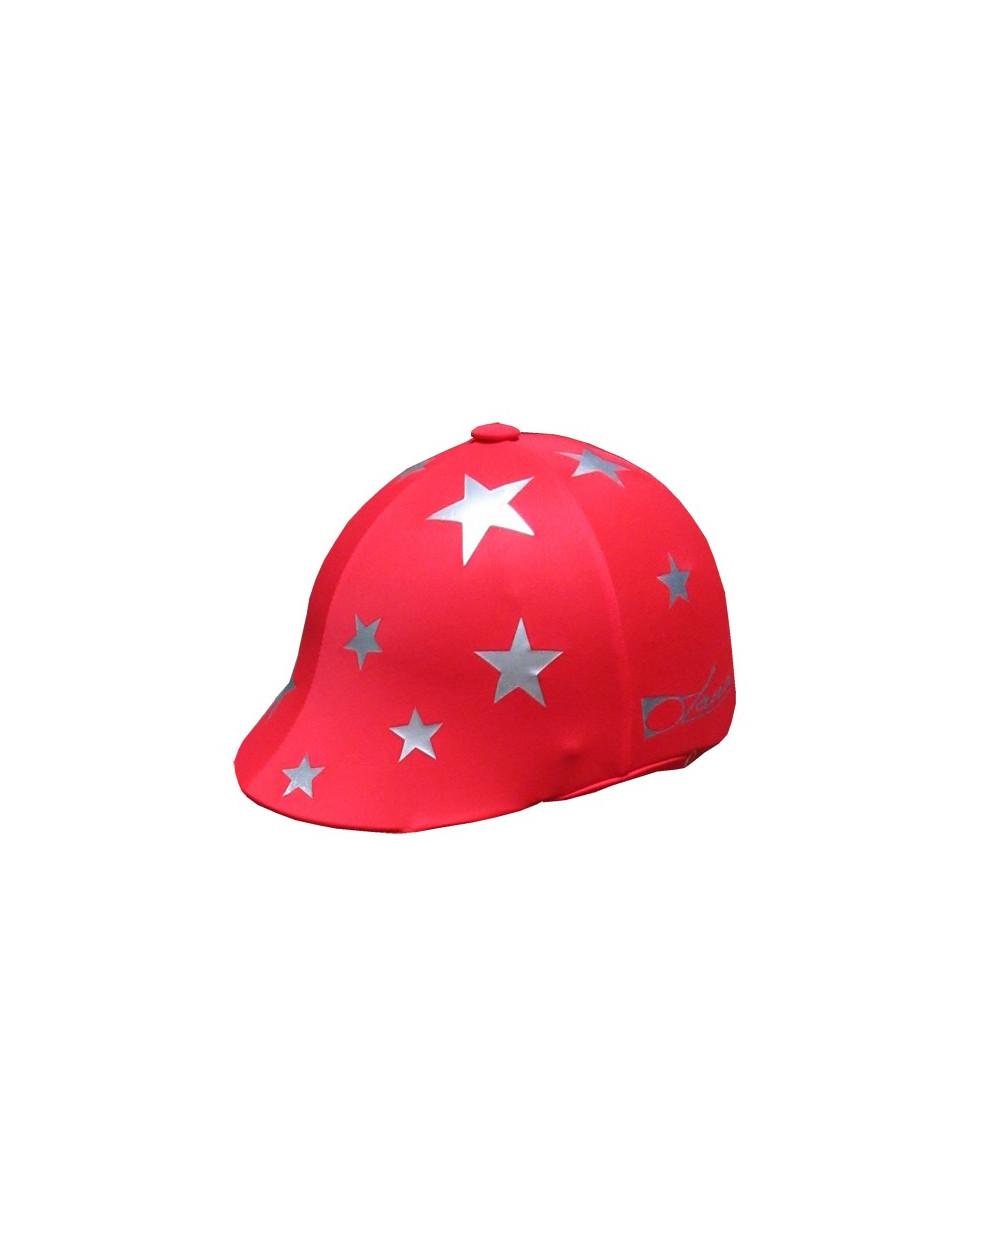 Olana Flex Star